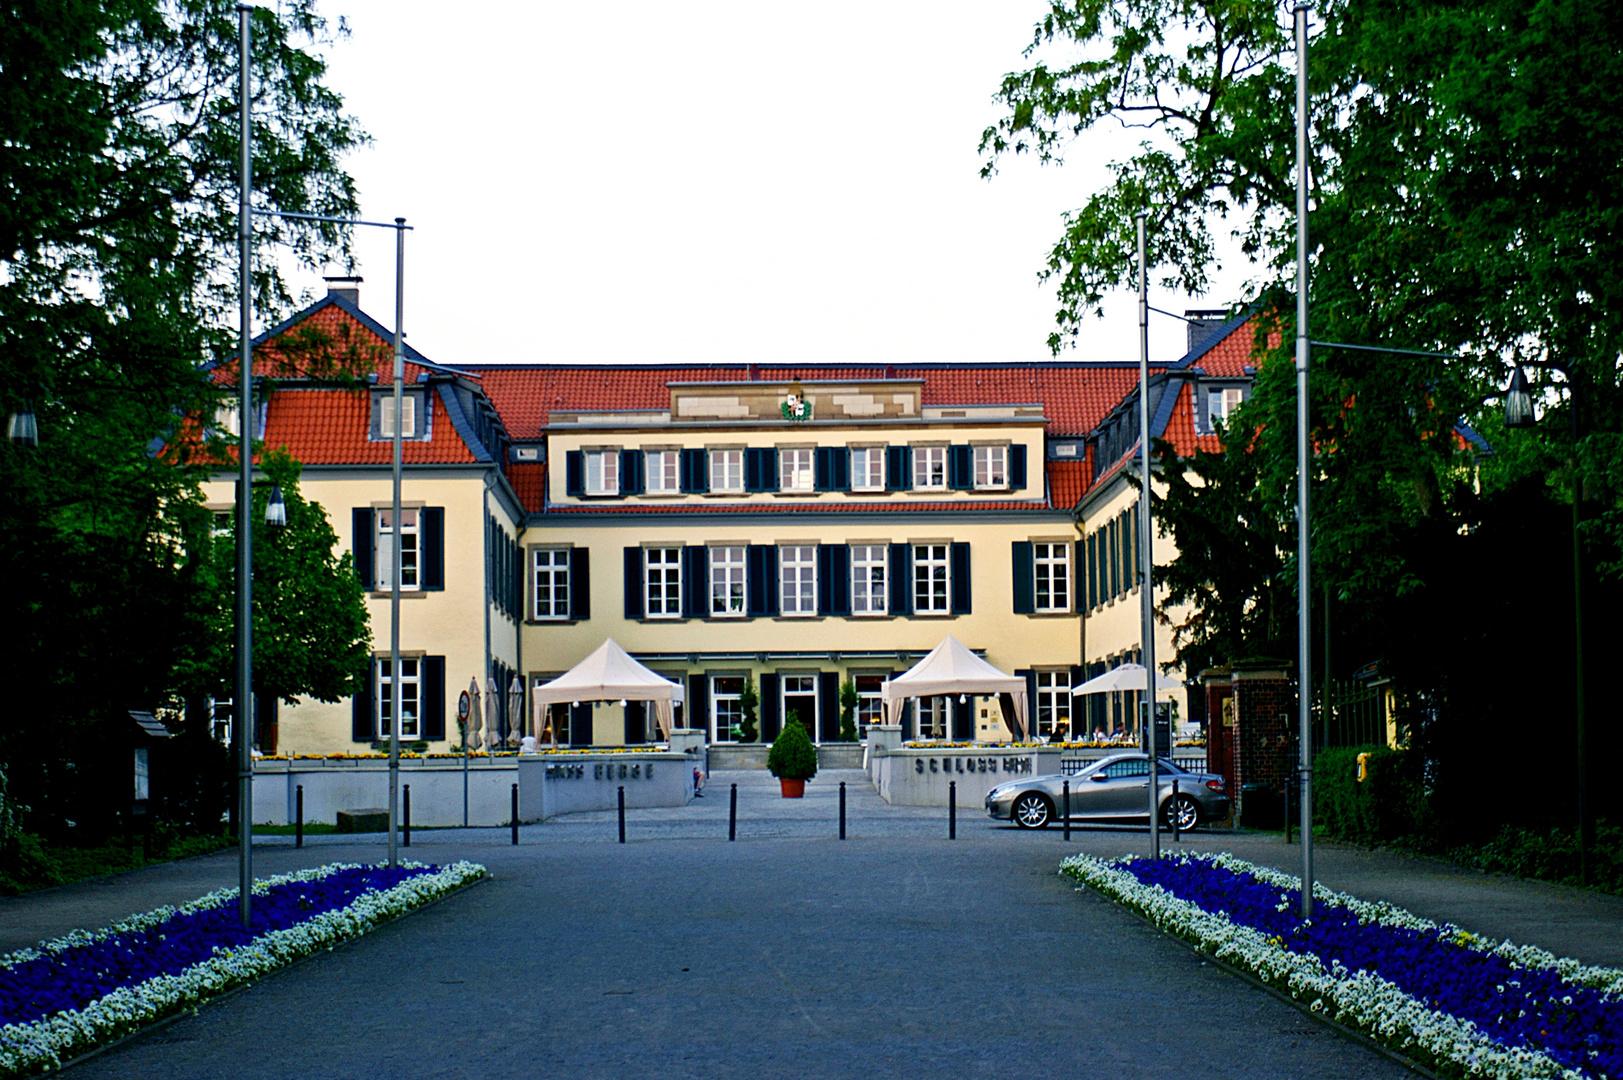 Schloß Berge in Gelsenkirchen